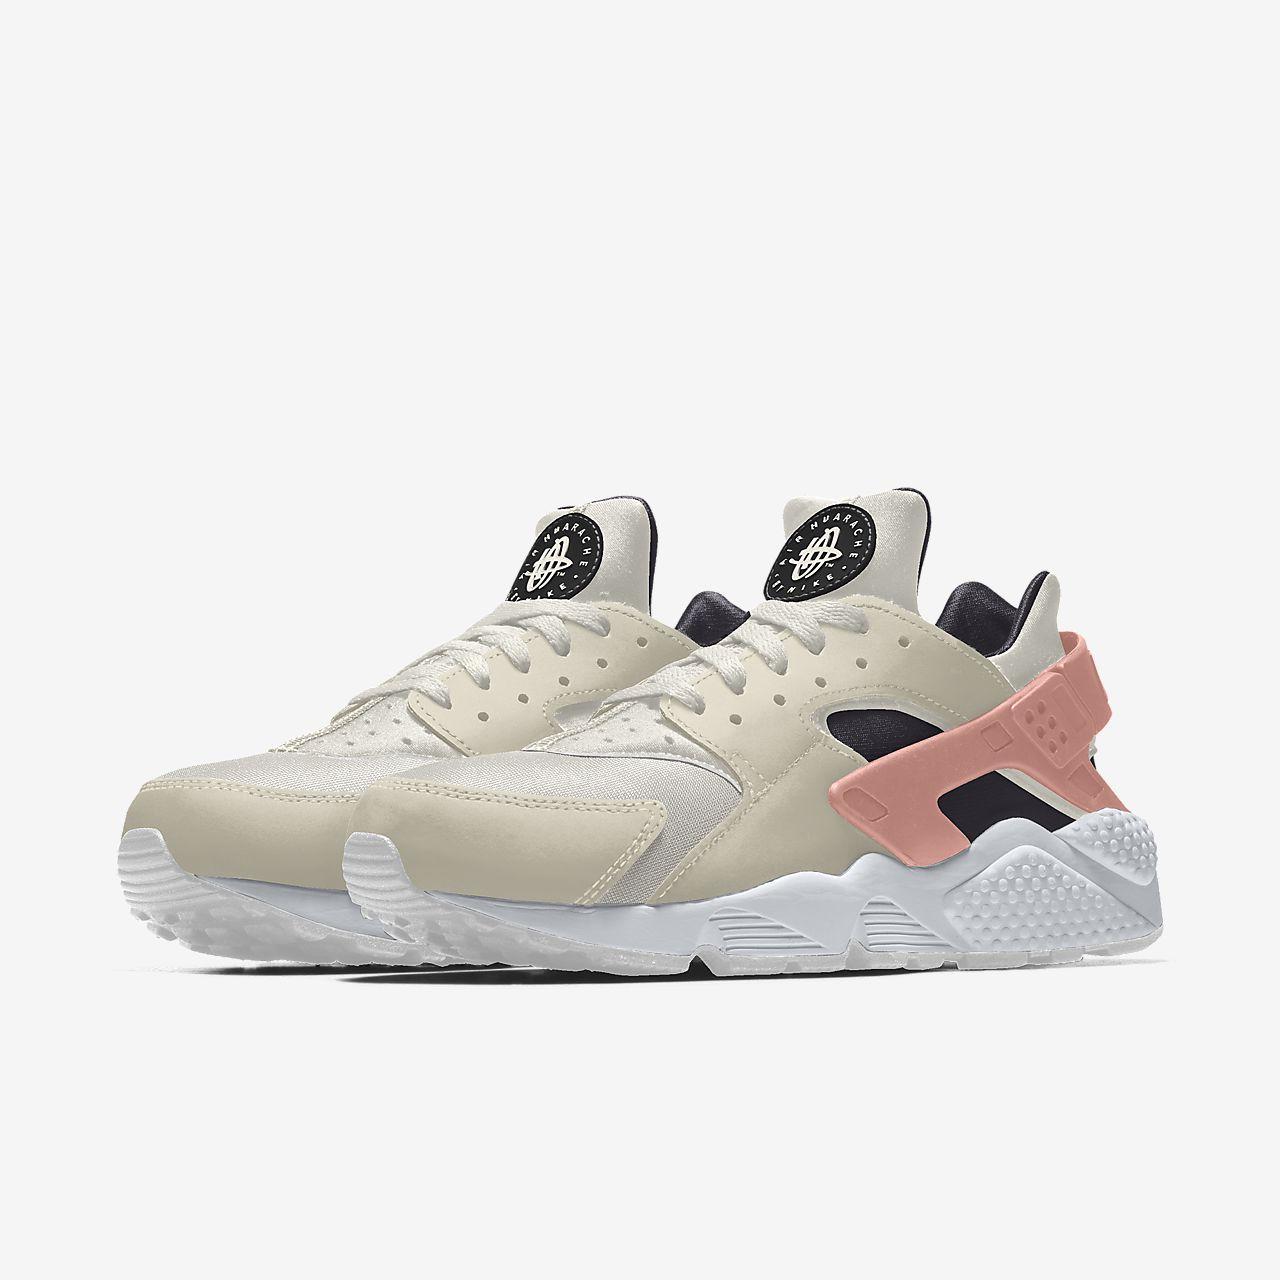 Męskie personalizowane buty Nike Air Huarache By You